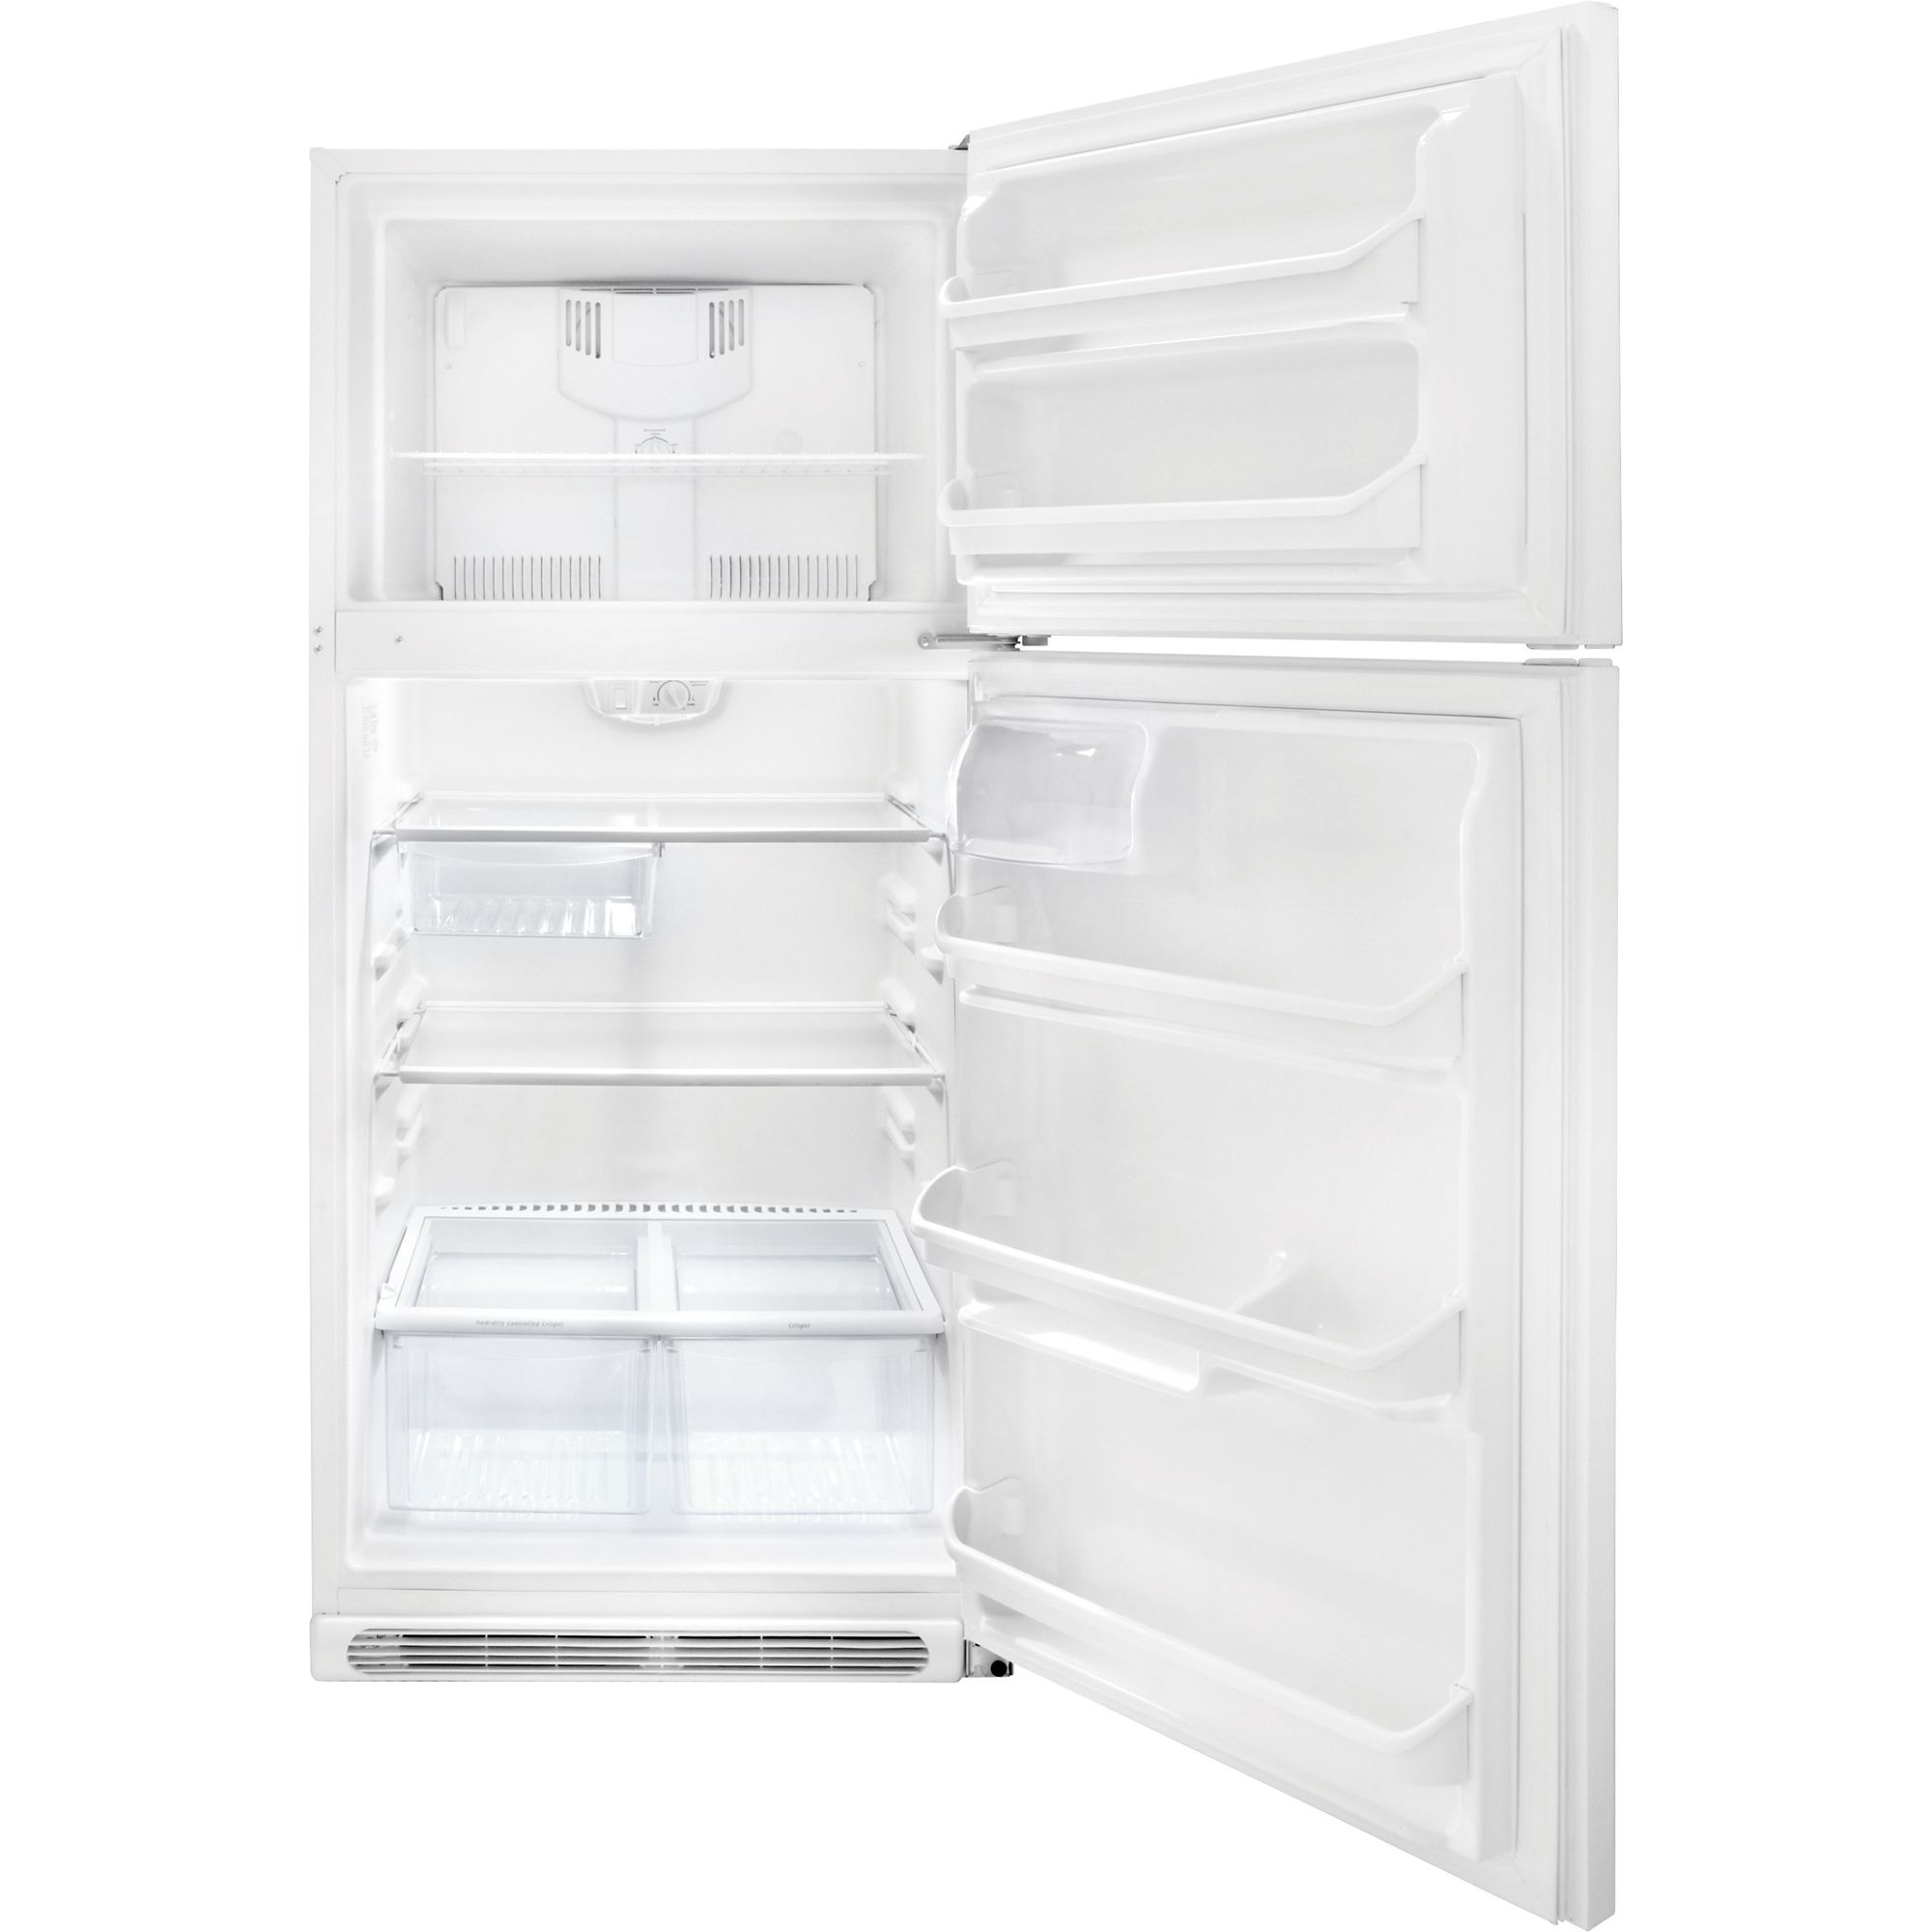 Frigidaire 20.6 cu. ft. Top Freezer Refrigerator (FFHT2117L)